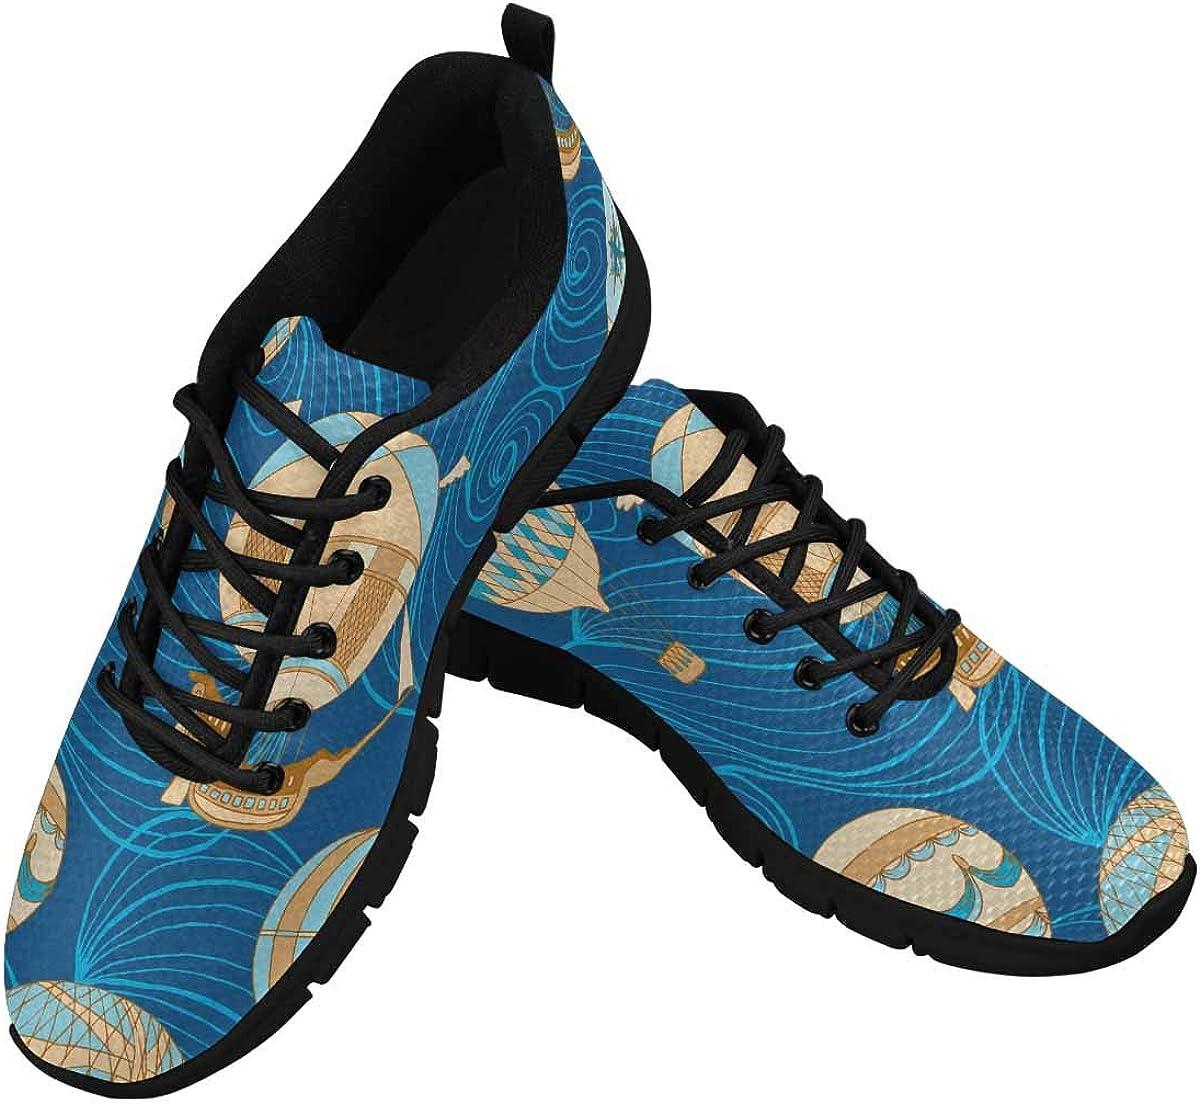 InterestPrint Aerostats Pattern Women's Lightweight Athletic Casual Gym Sneakers